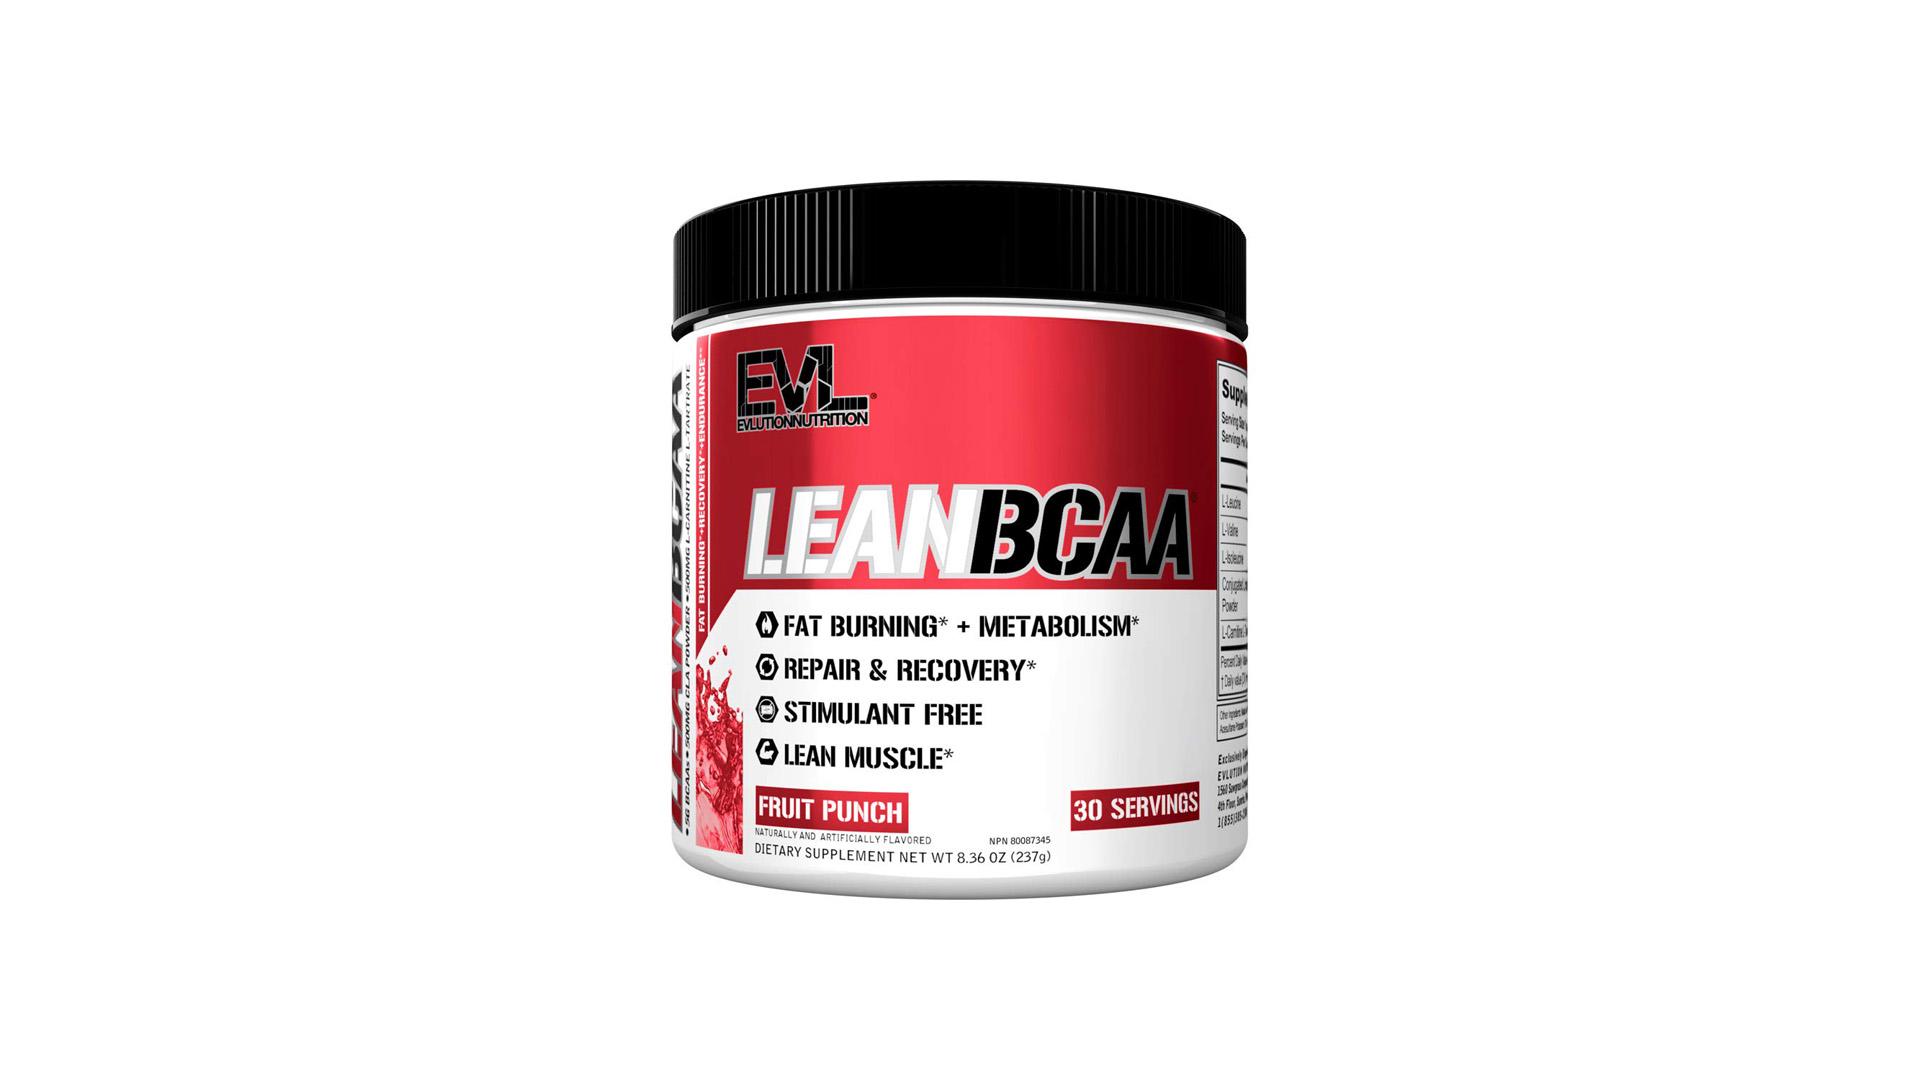 LEAN BCAA by EVL